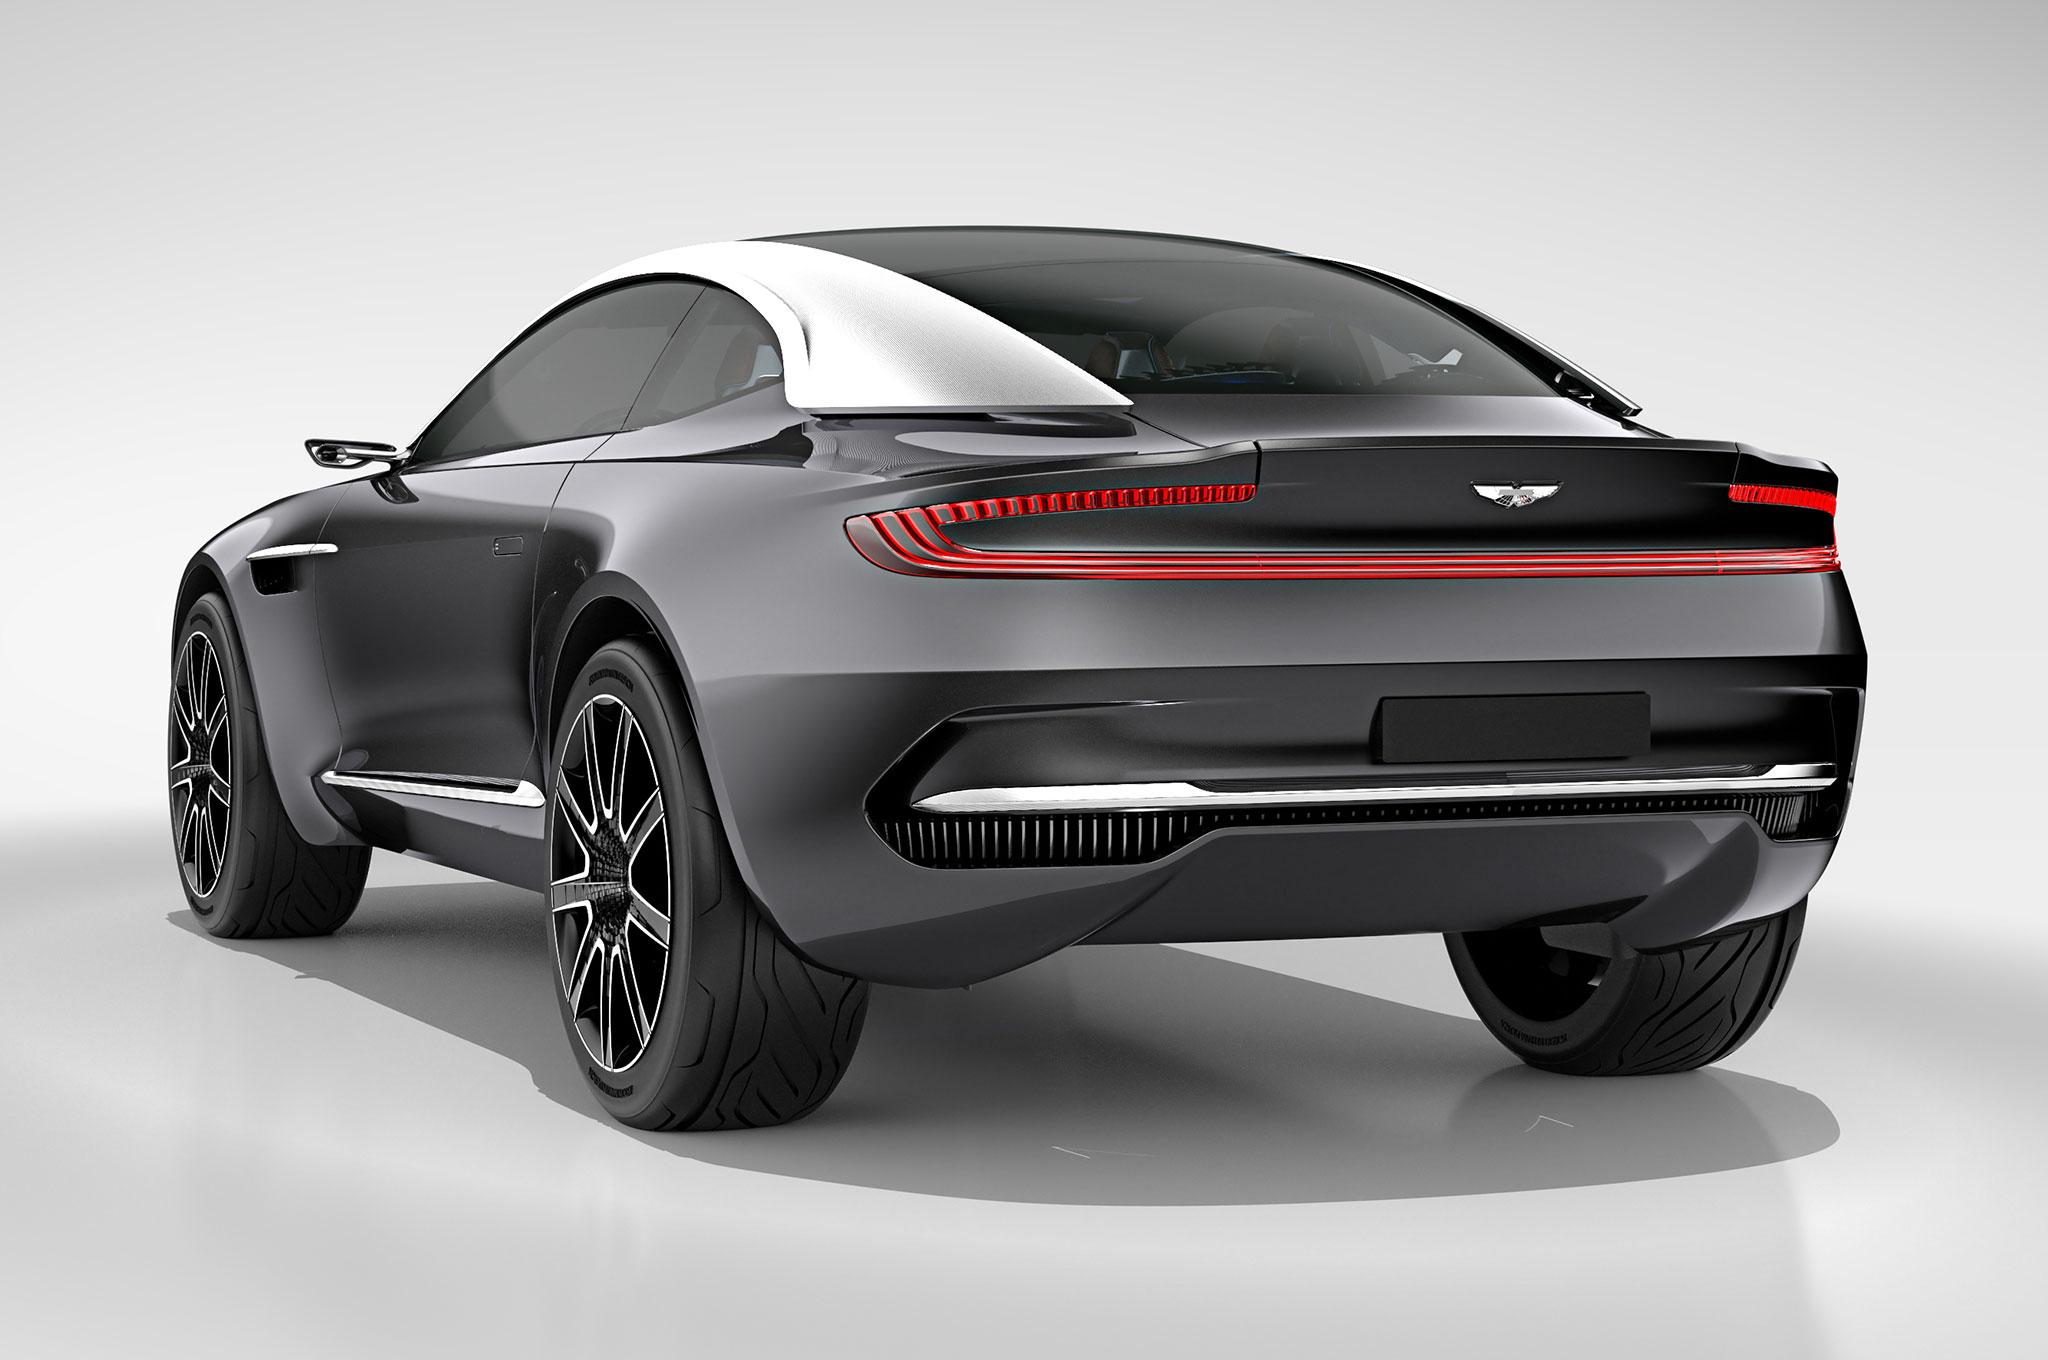 By Design: Aston Martin DBX Concept